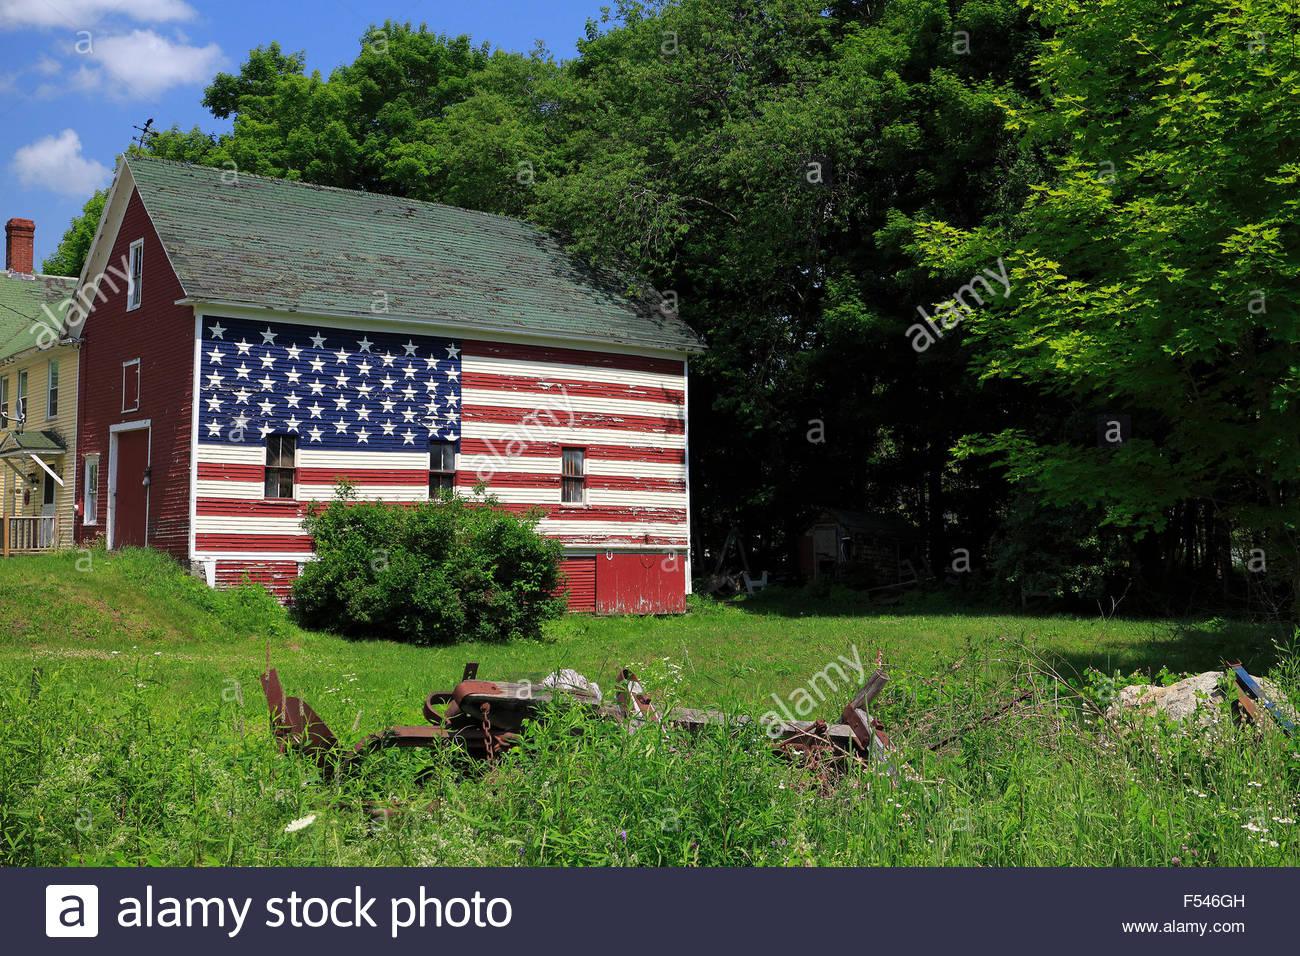 a-barn-in-morrill-waldo-county-maine-usa